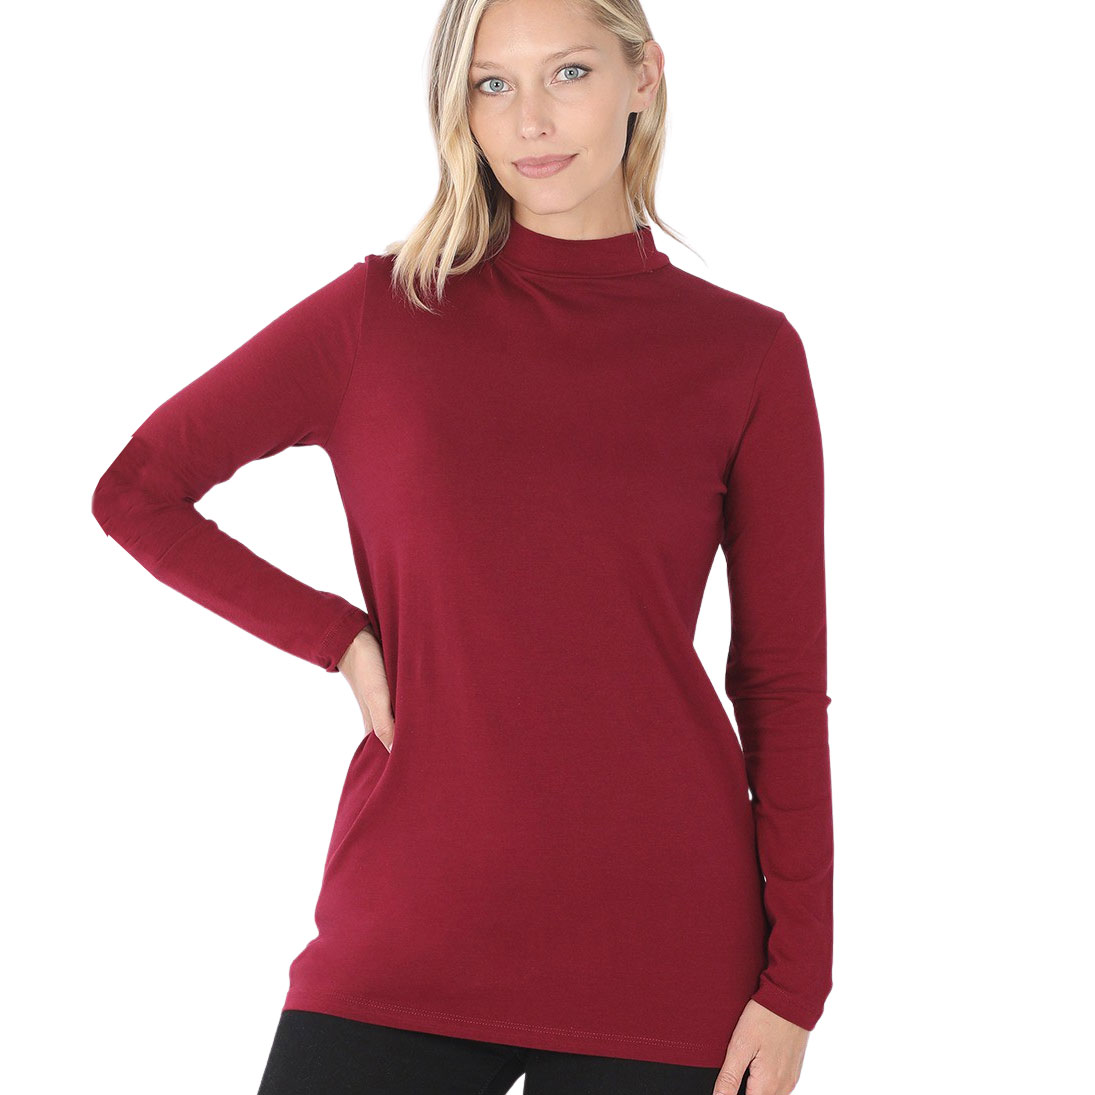 Mock Turtleneck - Cotton Long Sleeve 1059 - Cabernet Mock Turtleneck - Cotton Long Sleeve 1059